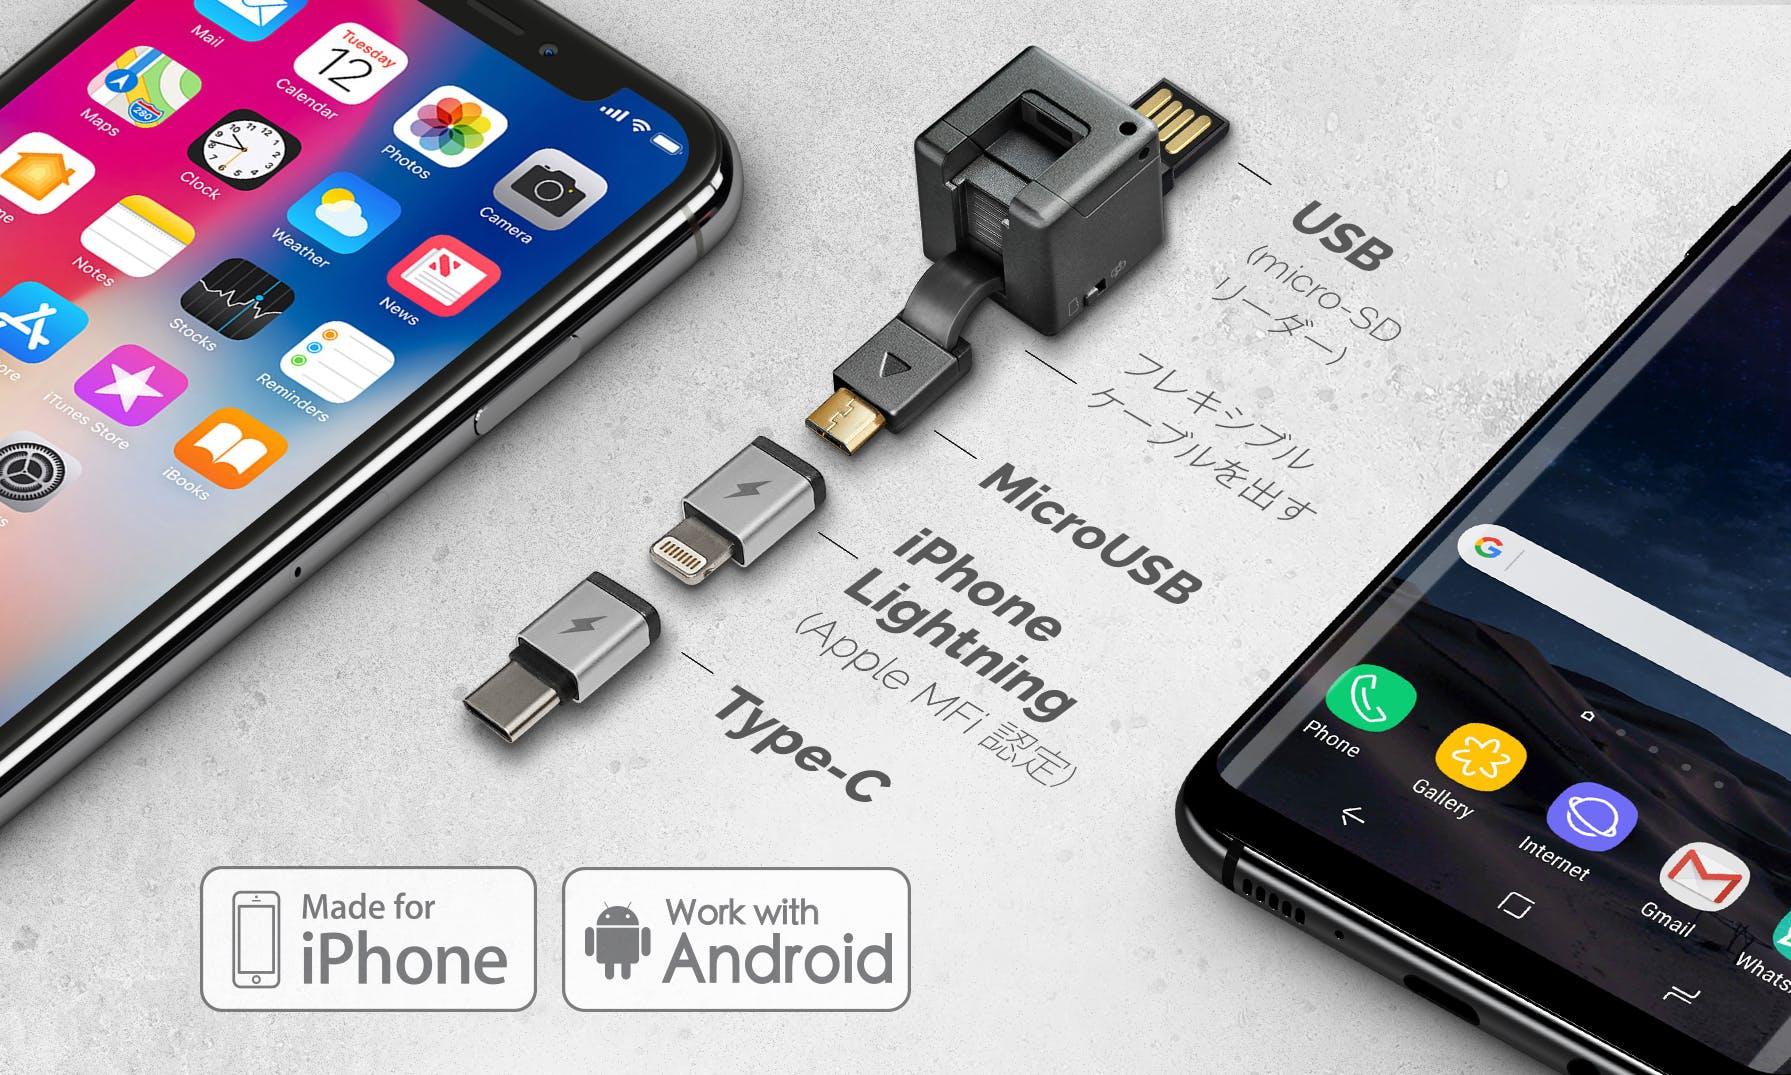 iPhoneもAndroidも充電できるガジェット「WonderCube PRO」が登場